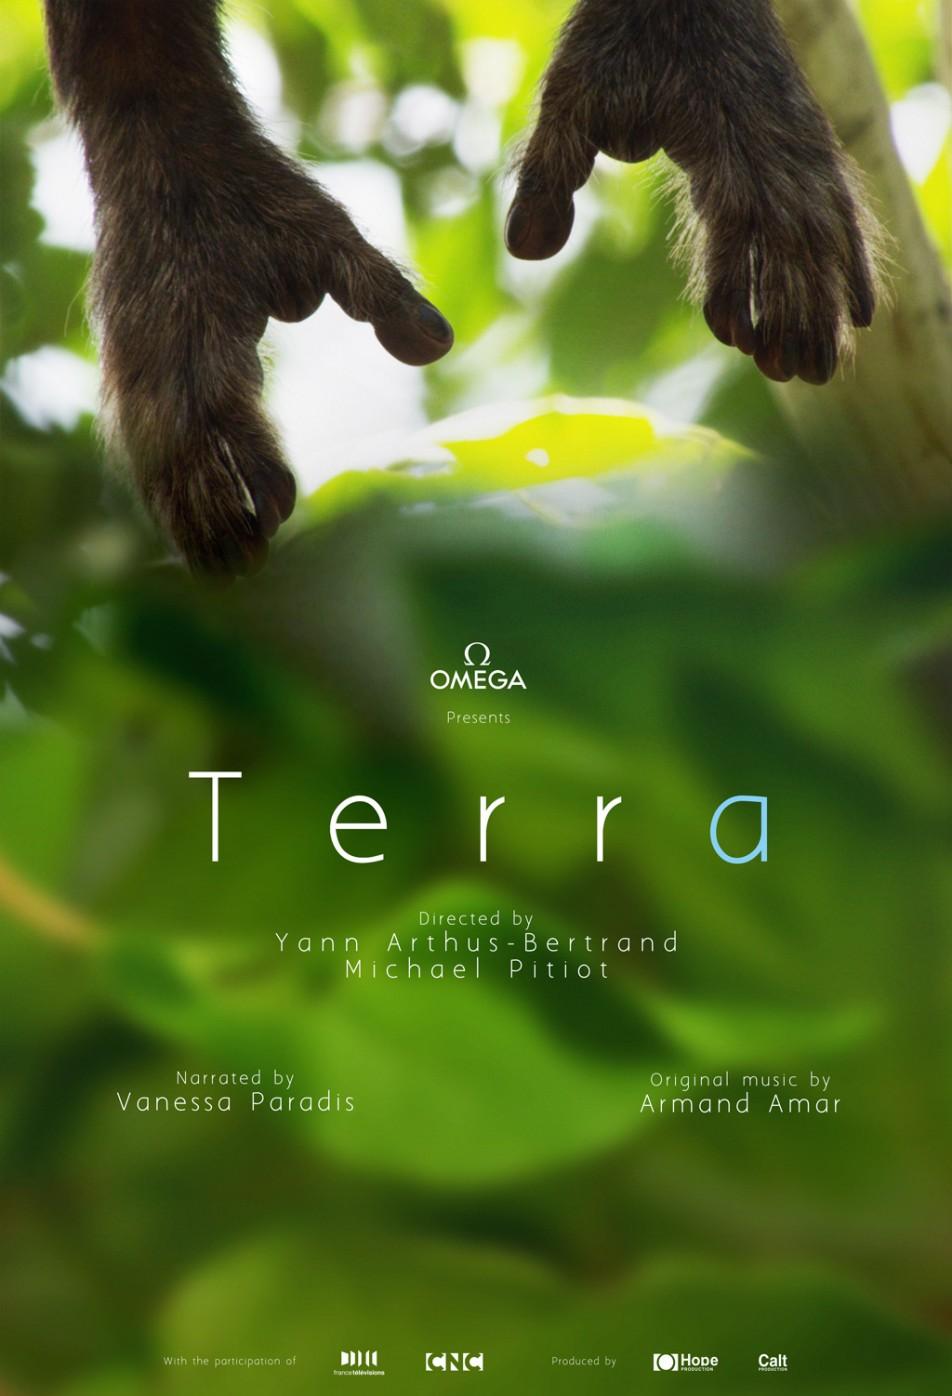 20160201-Terra-Affiche-vertical-WEB-EN_l.jpg